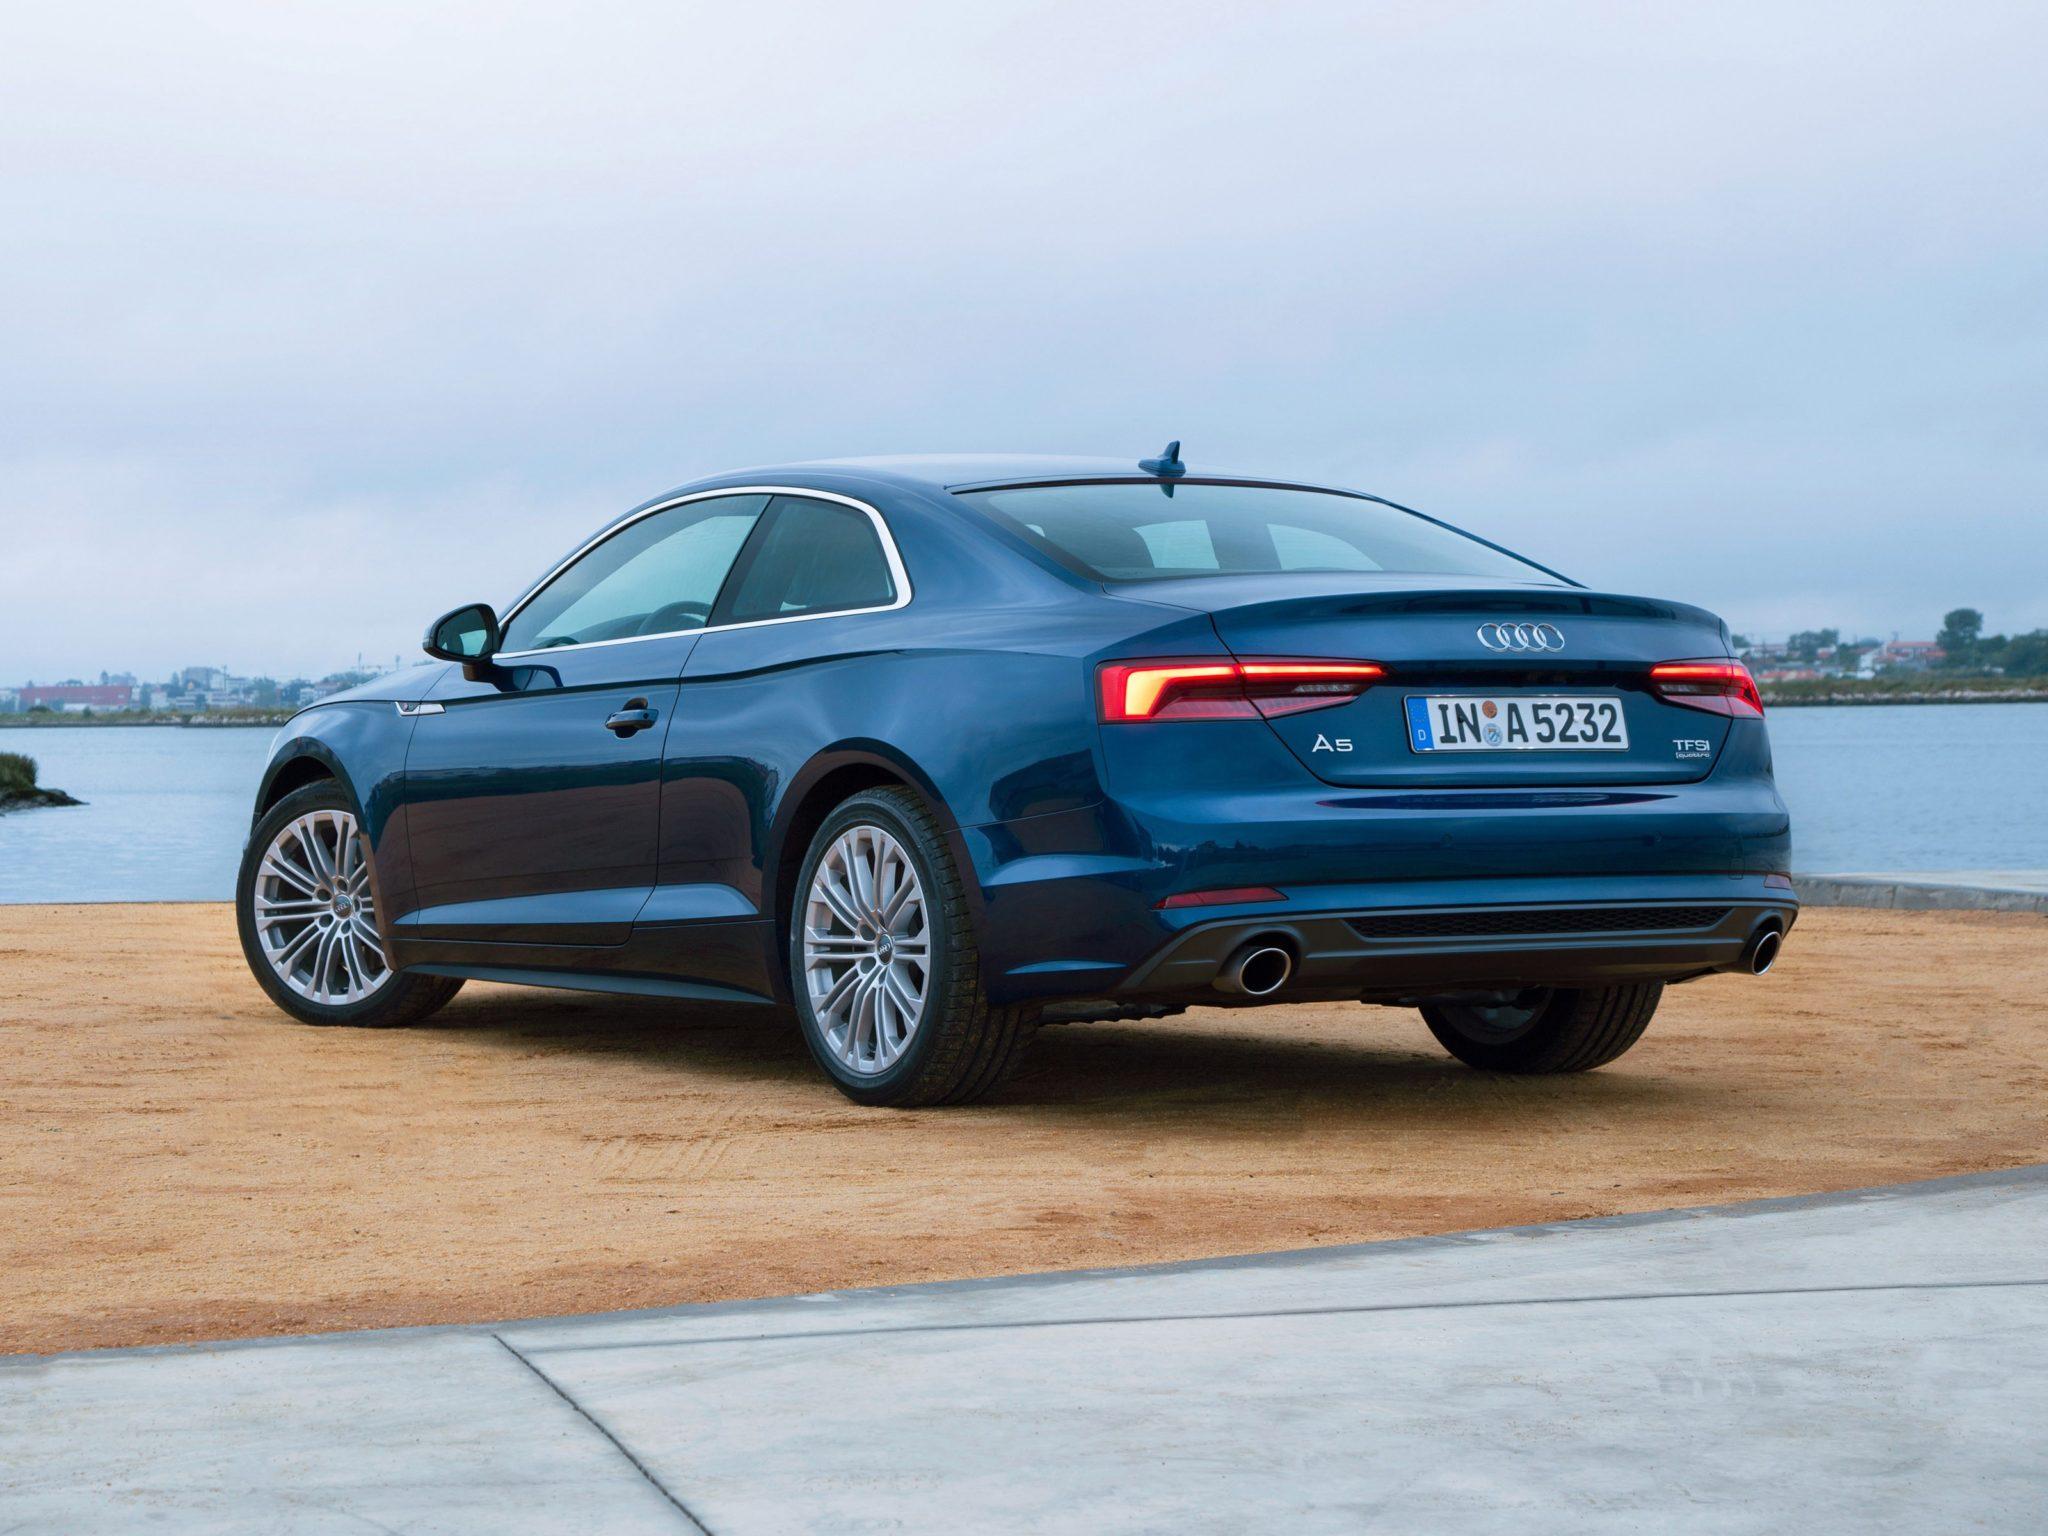 Audi A5 2.0 TFSI Quattro S-Line Coupe 2016